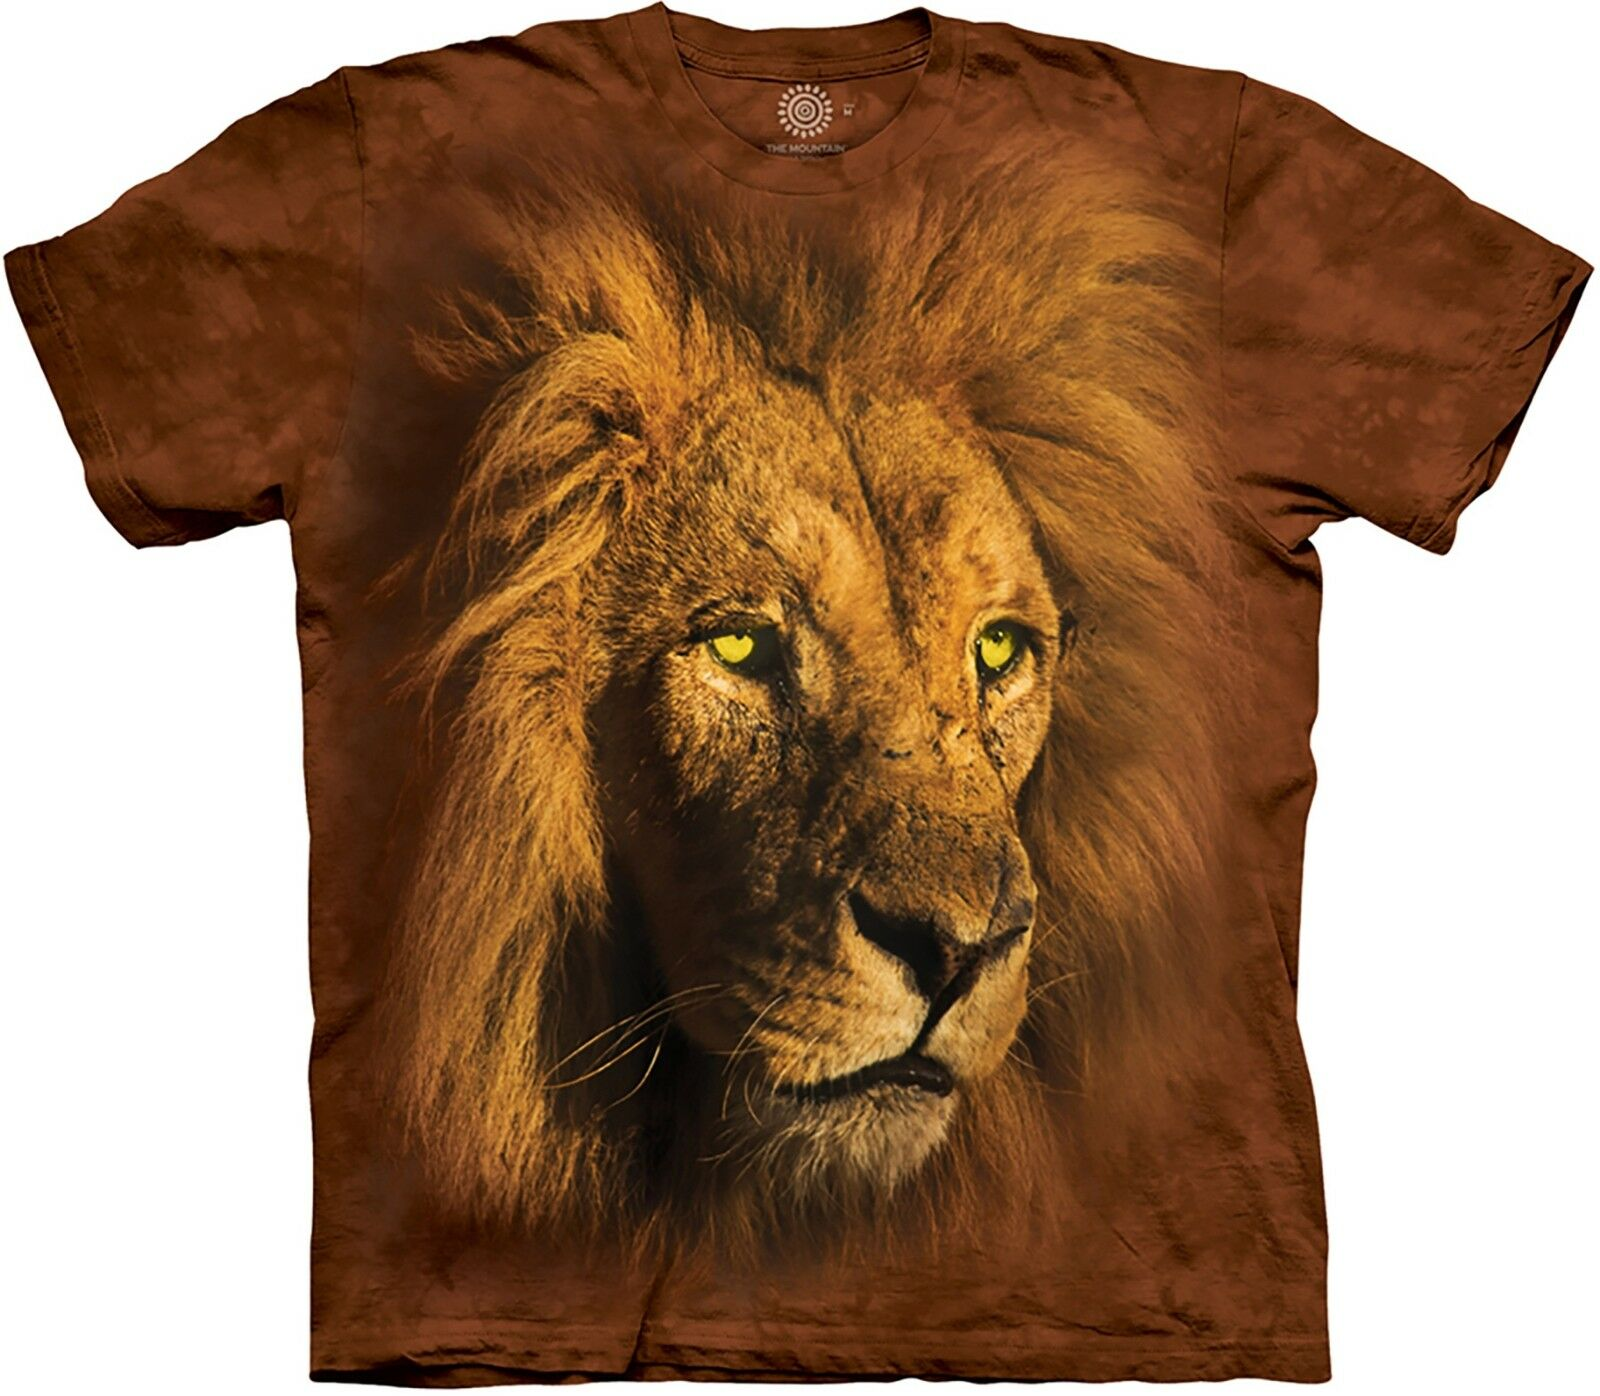 The Mountain Unisex Adult Proud King Big Cat Animal T Shirt